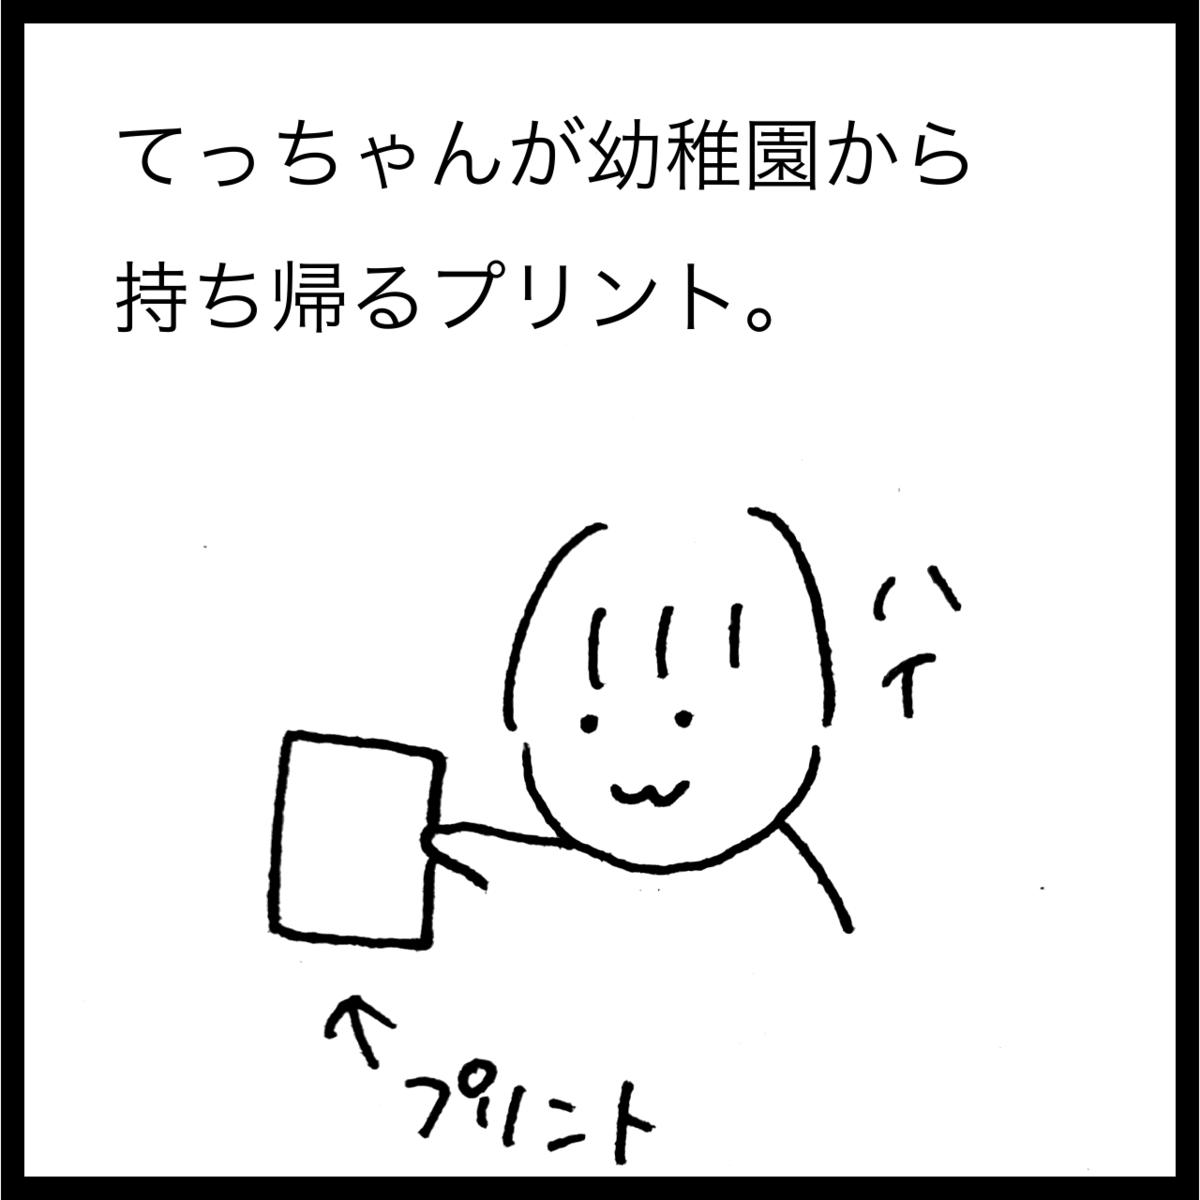 f:id:komyusyomama:20211007174832p:plain